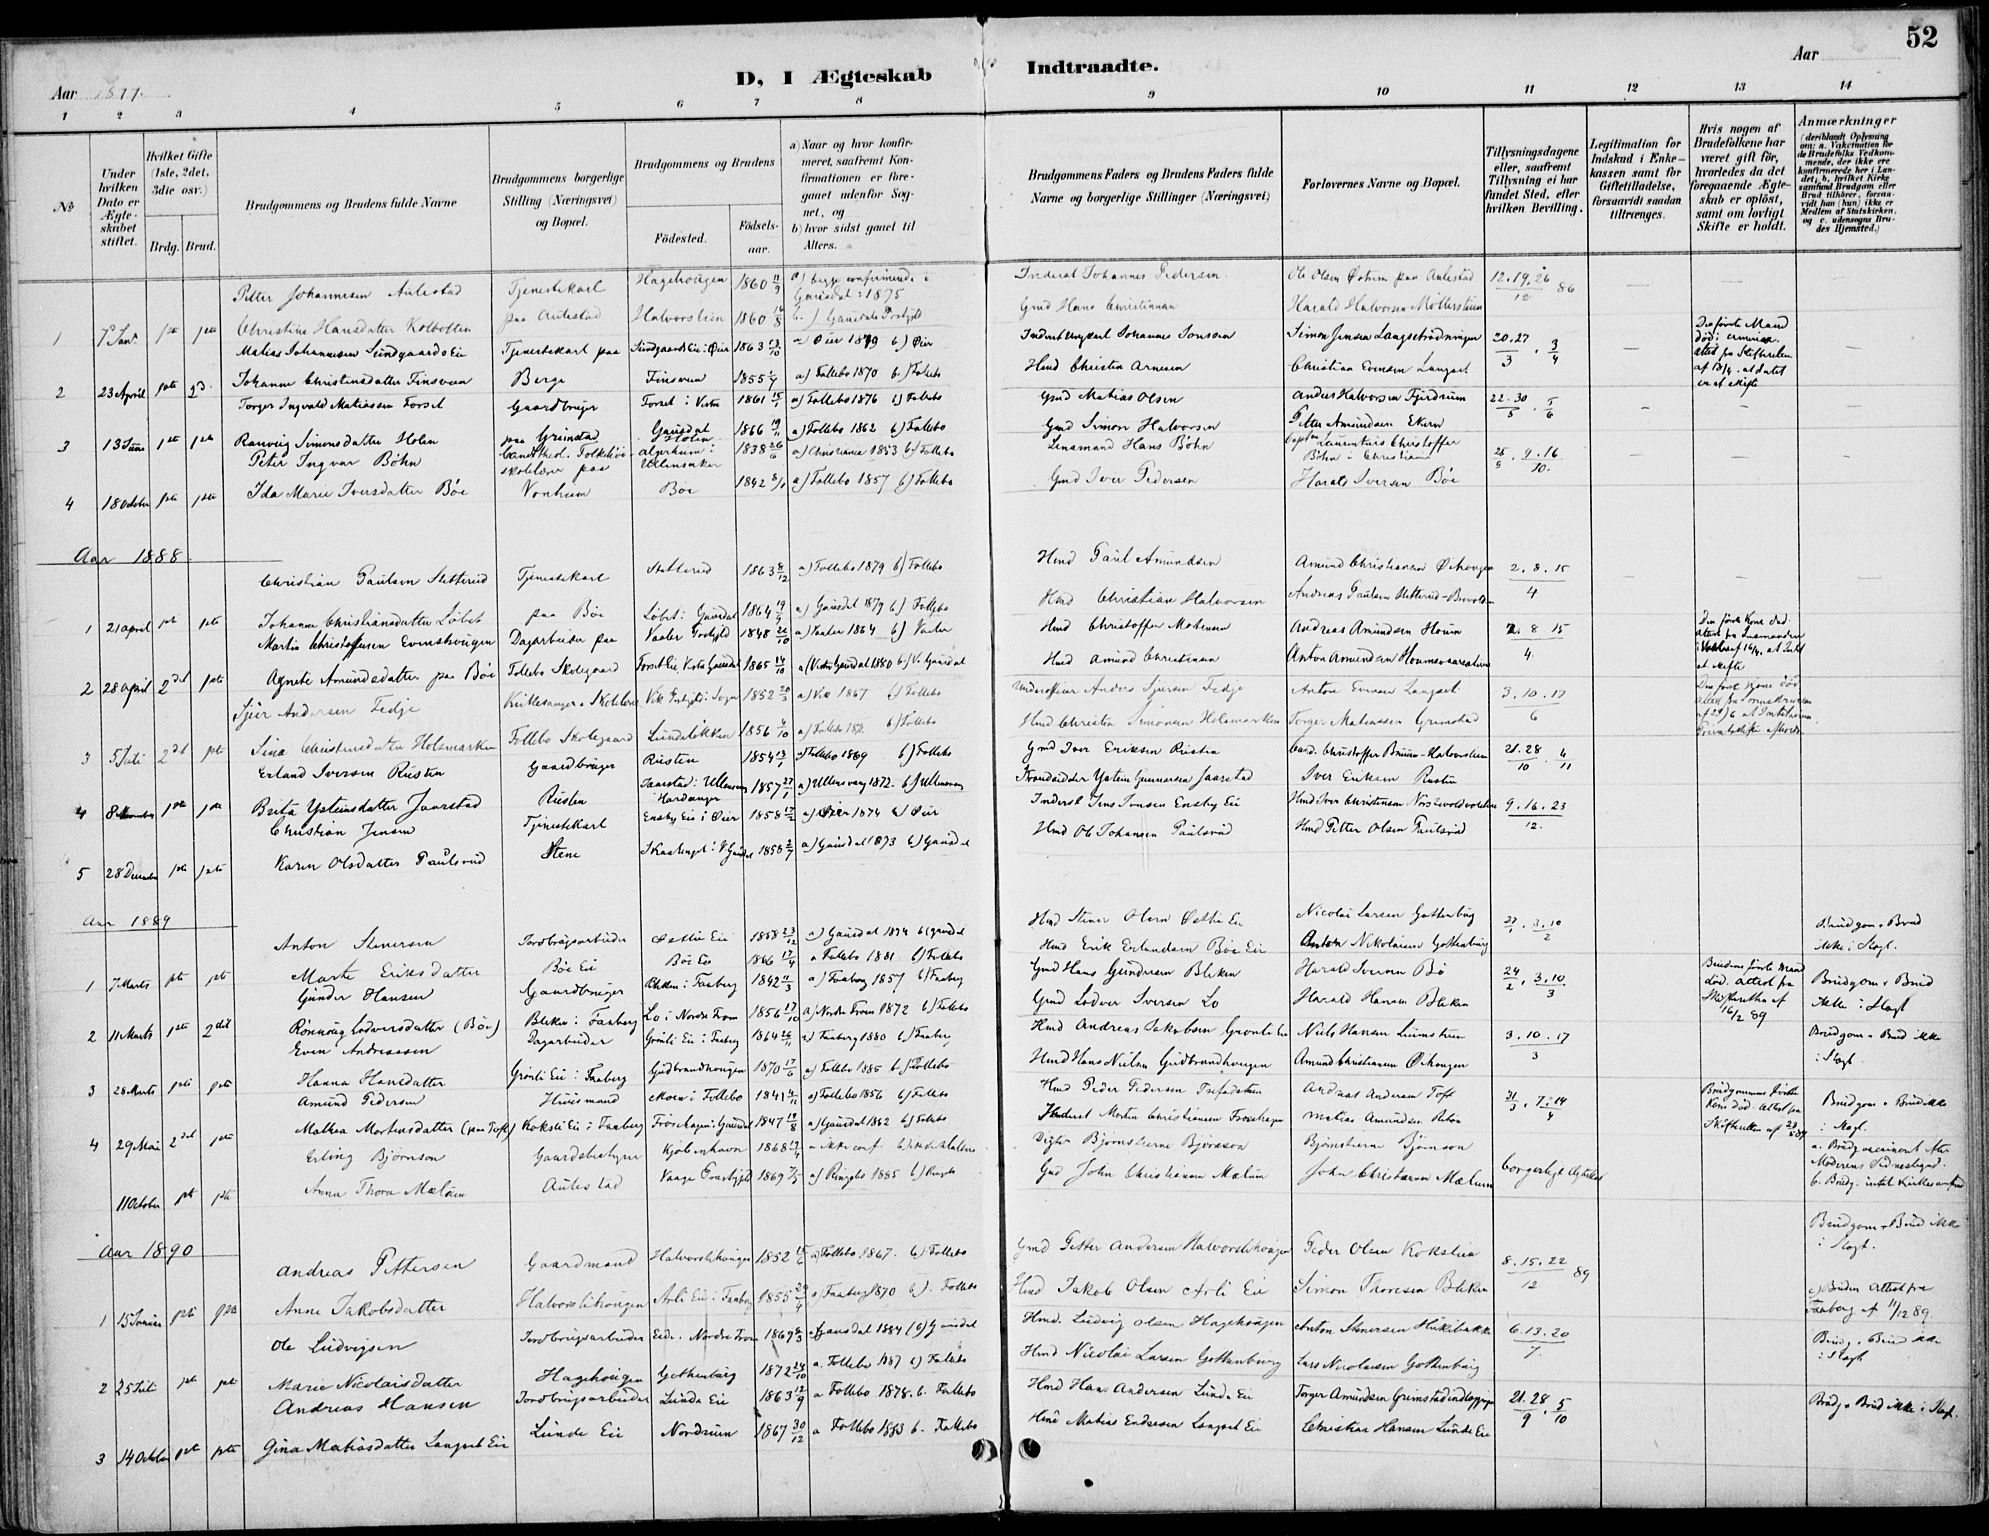 SAH, Østre Gausdal prestekontor, Ministerialbok nr. 3, 1887-1901, s. 52